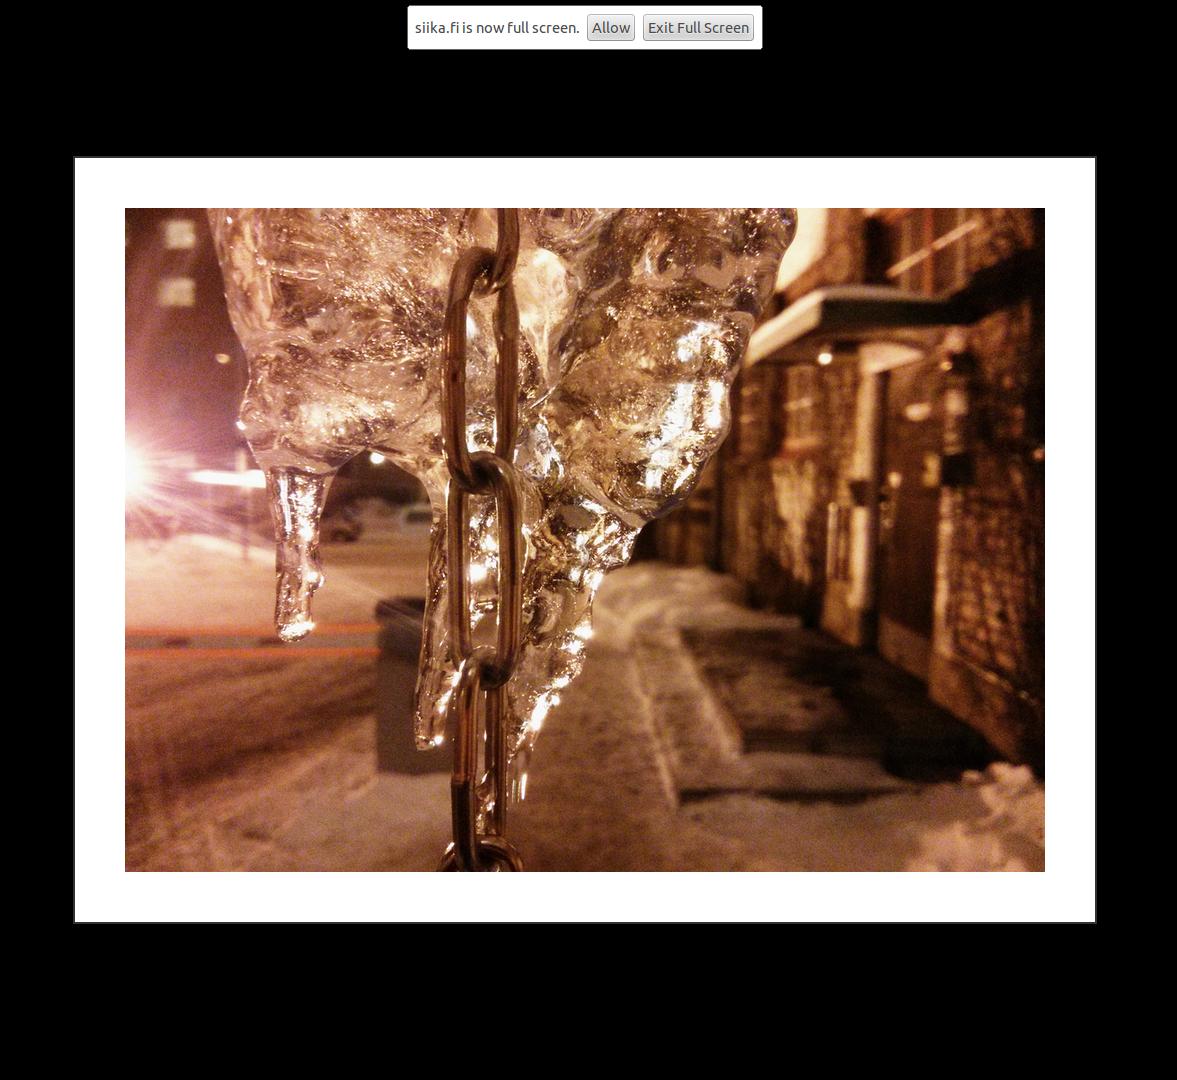 Demo application's image in fullscreen